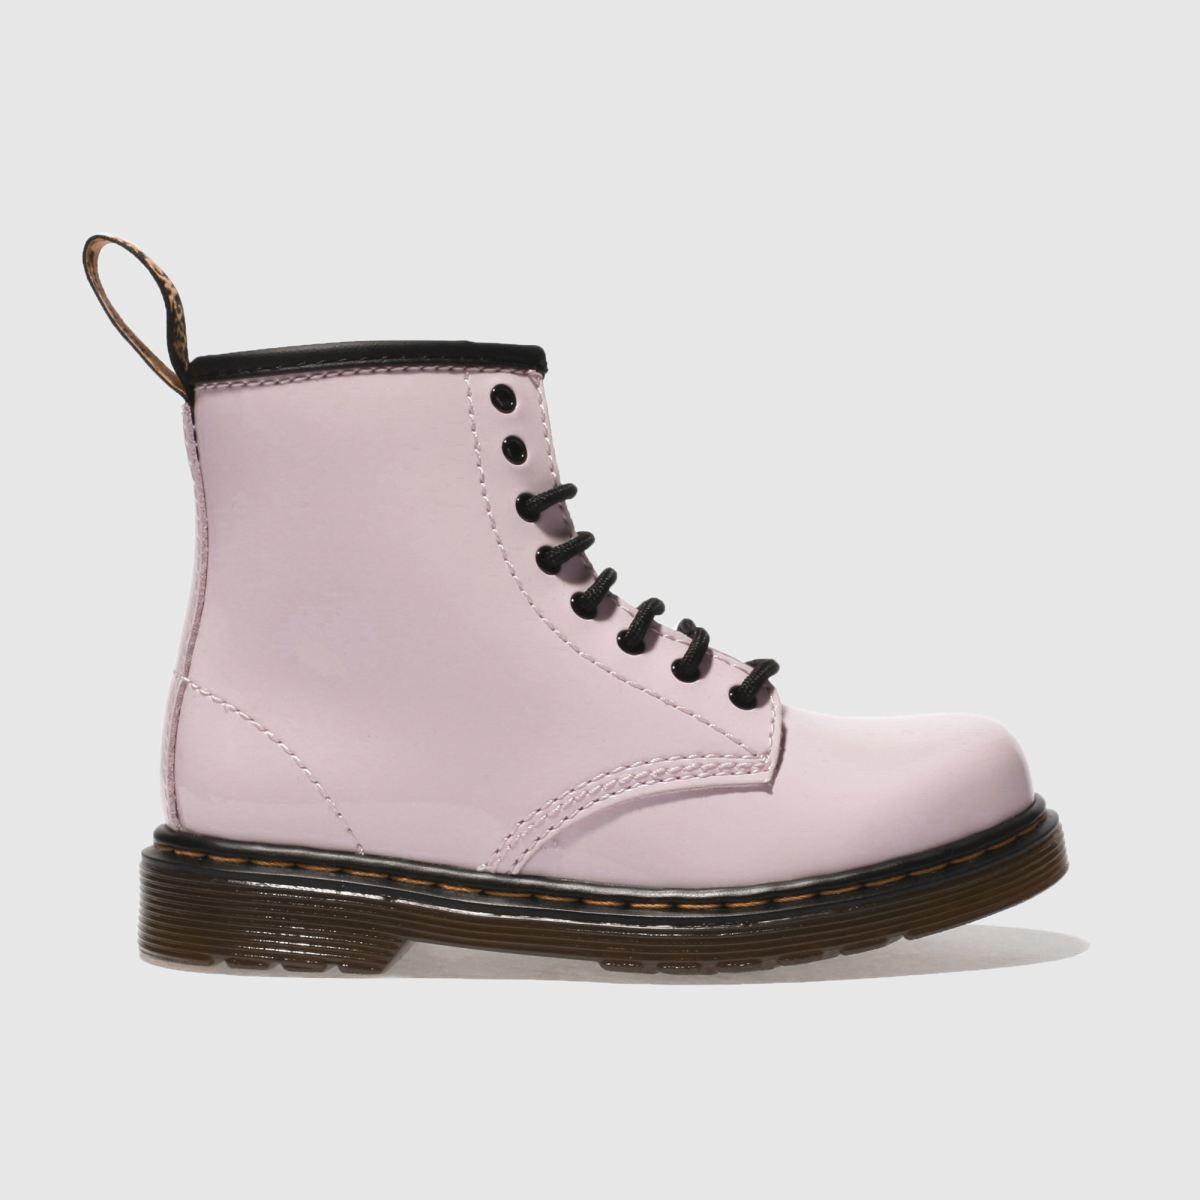 Dr Martens Pale Pink 1460 Girls Toddler Boots